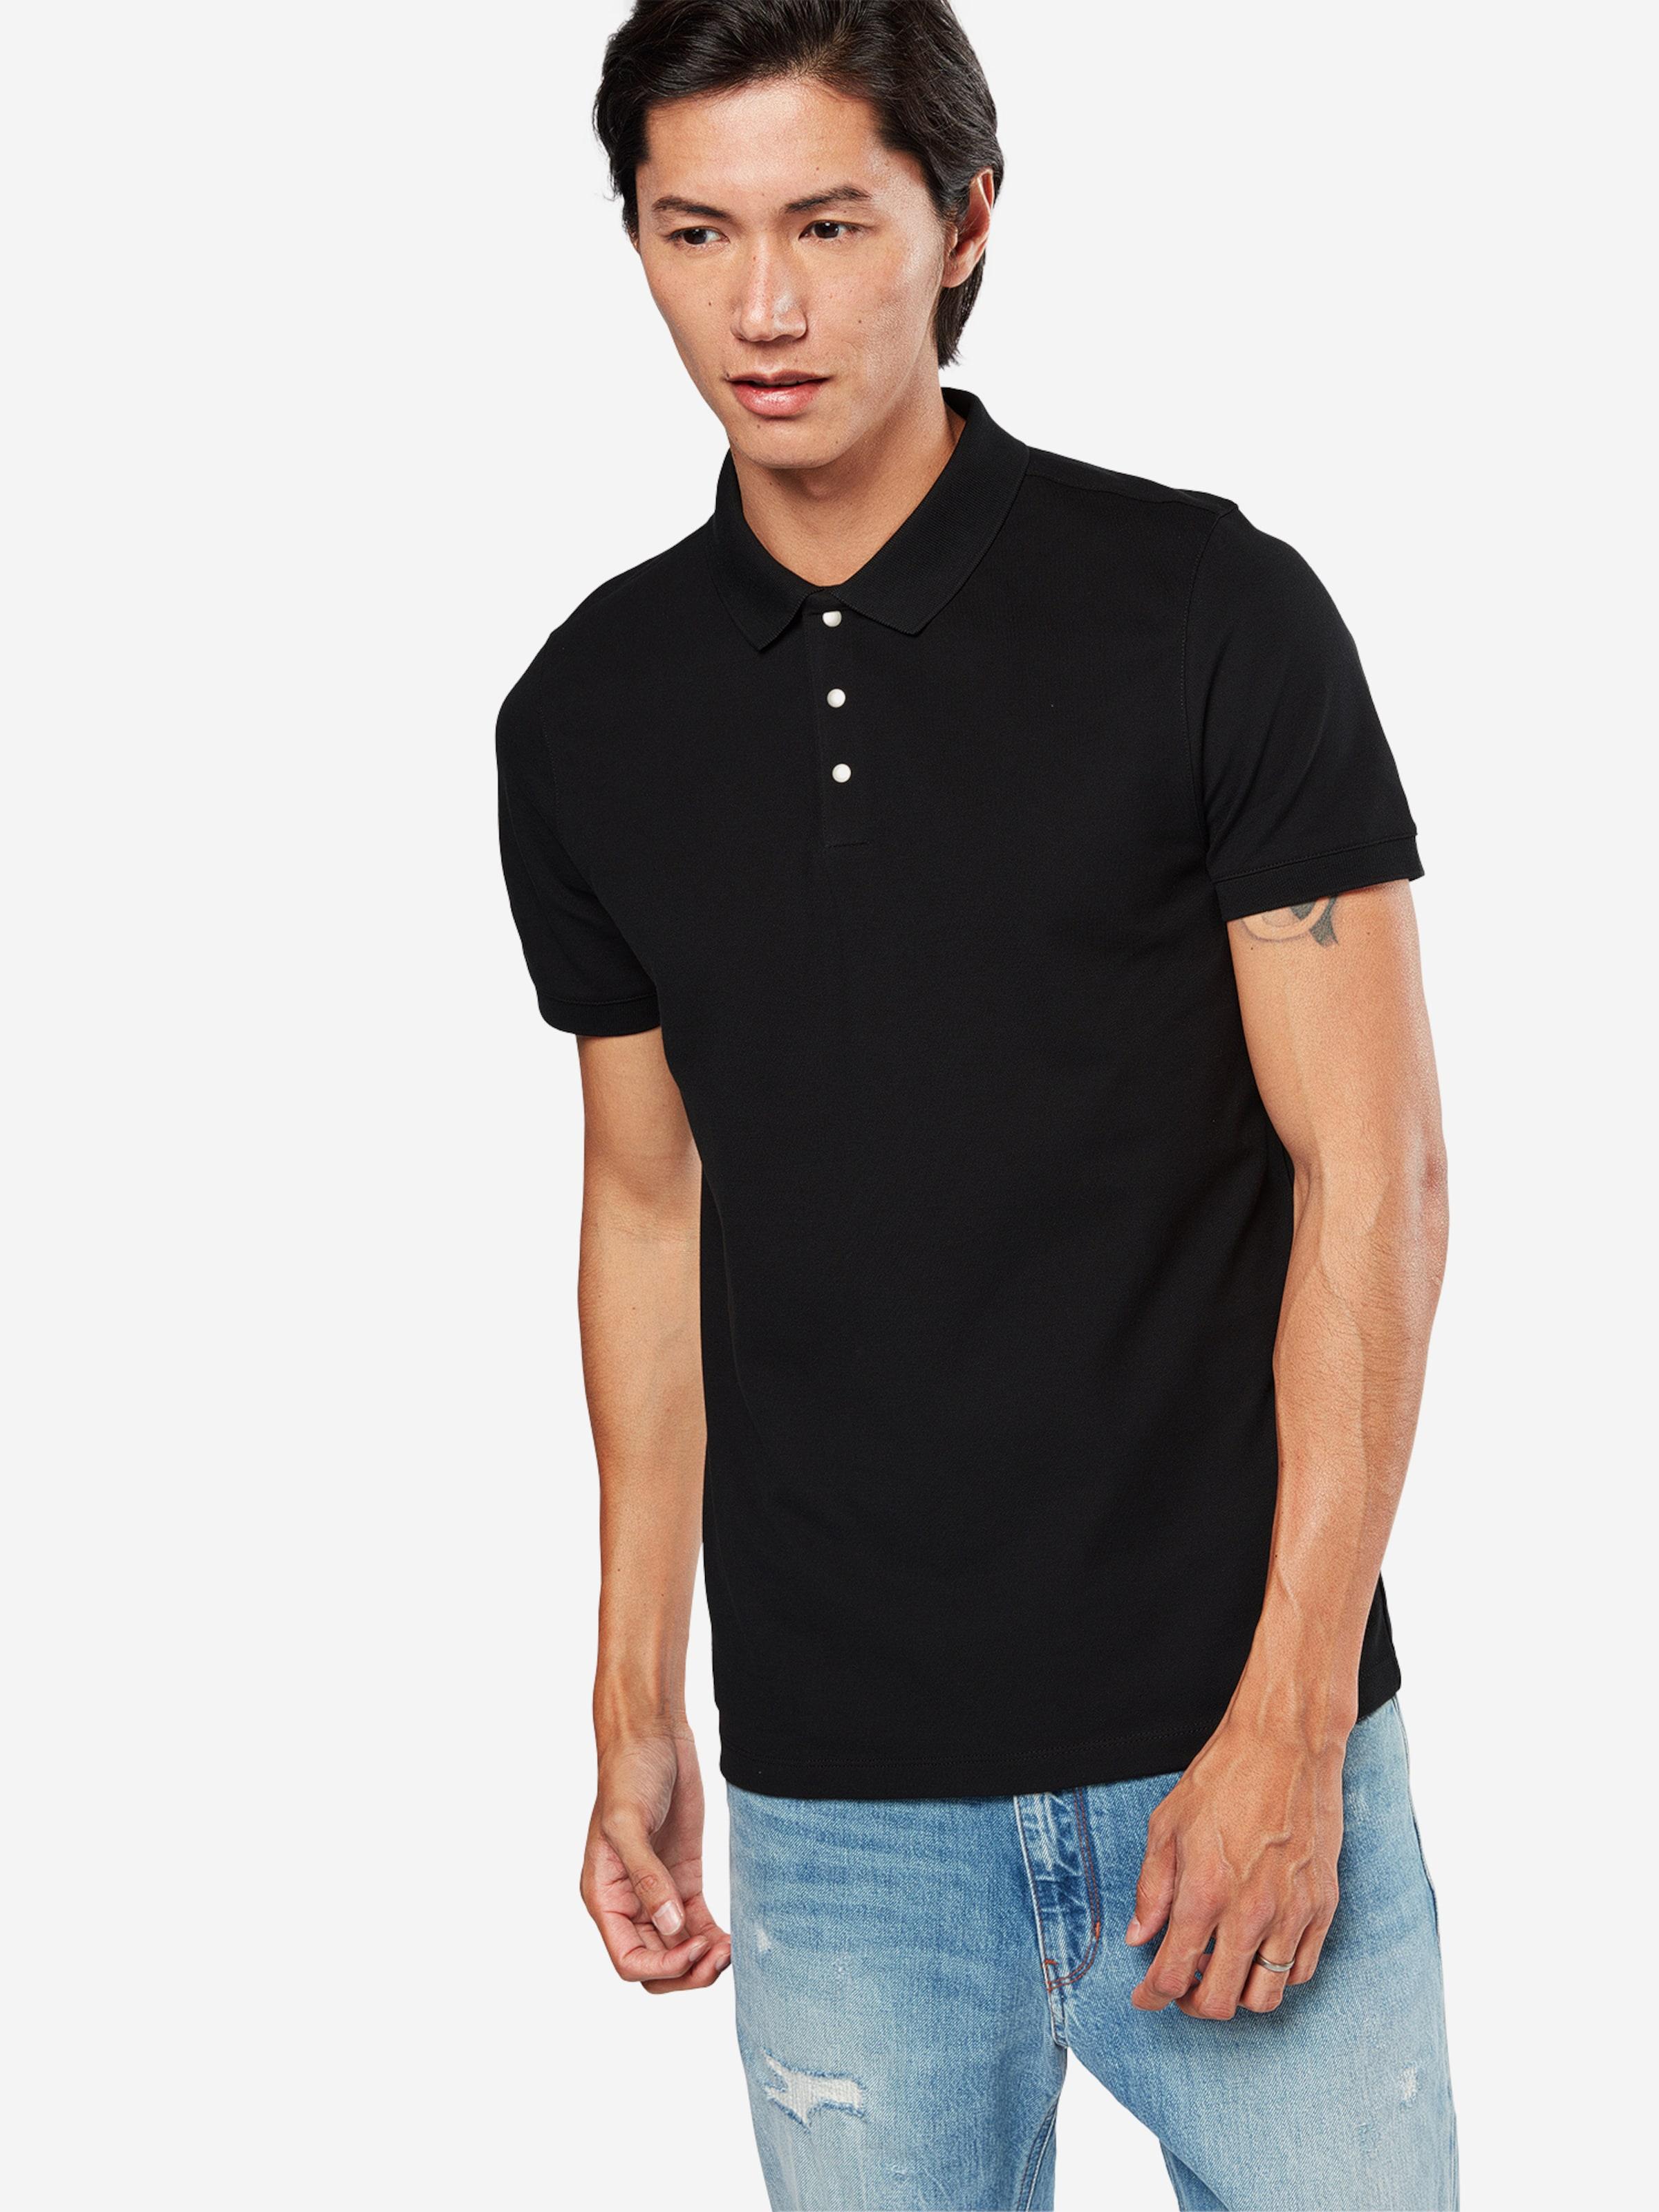 HOMME HOMME 'DAMON' Poloshirt Poloshirt 'DAMON' HOMME Poloshirt SELECTED 'DAMON' SELECTED SELECTED xCqdX6X